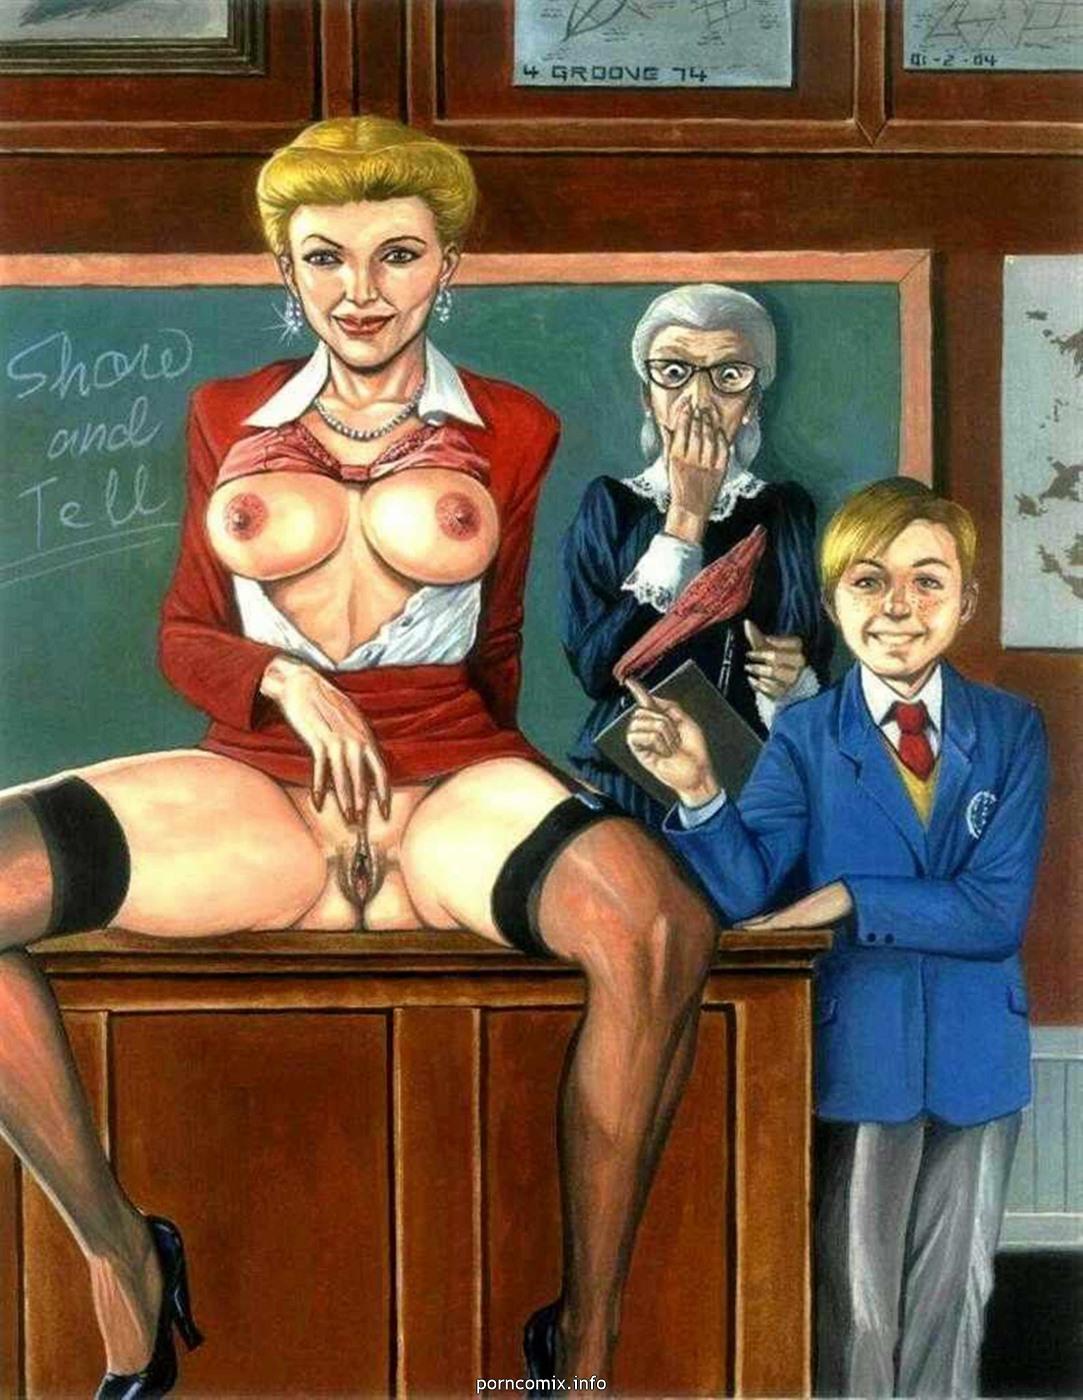 assez bizarre les parents Fop milftoon - - Hentai comics